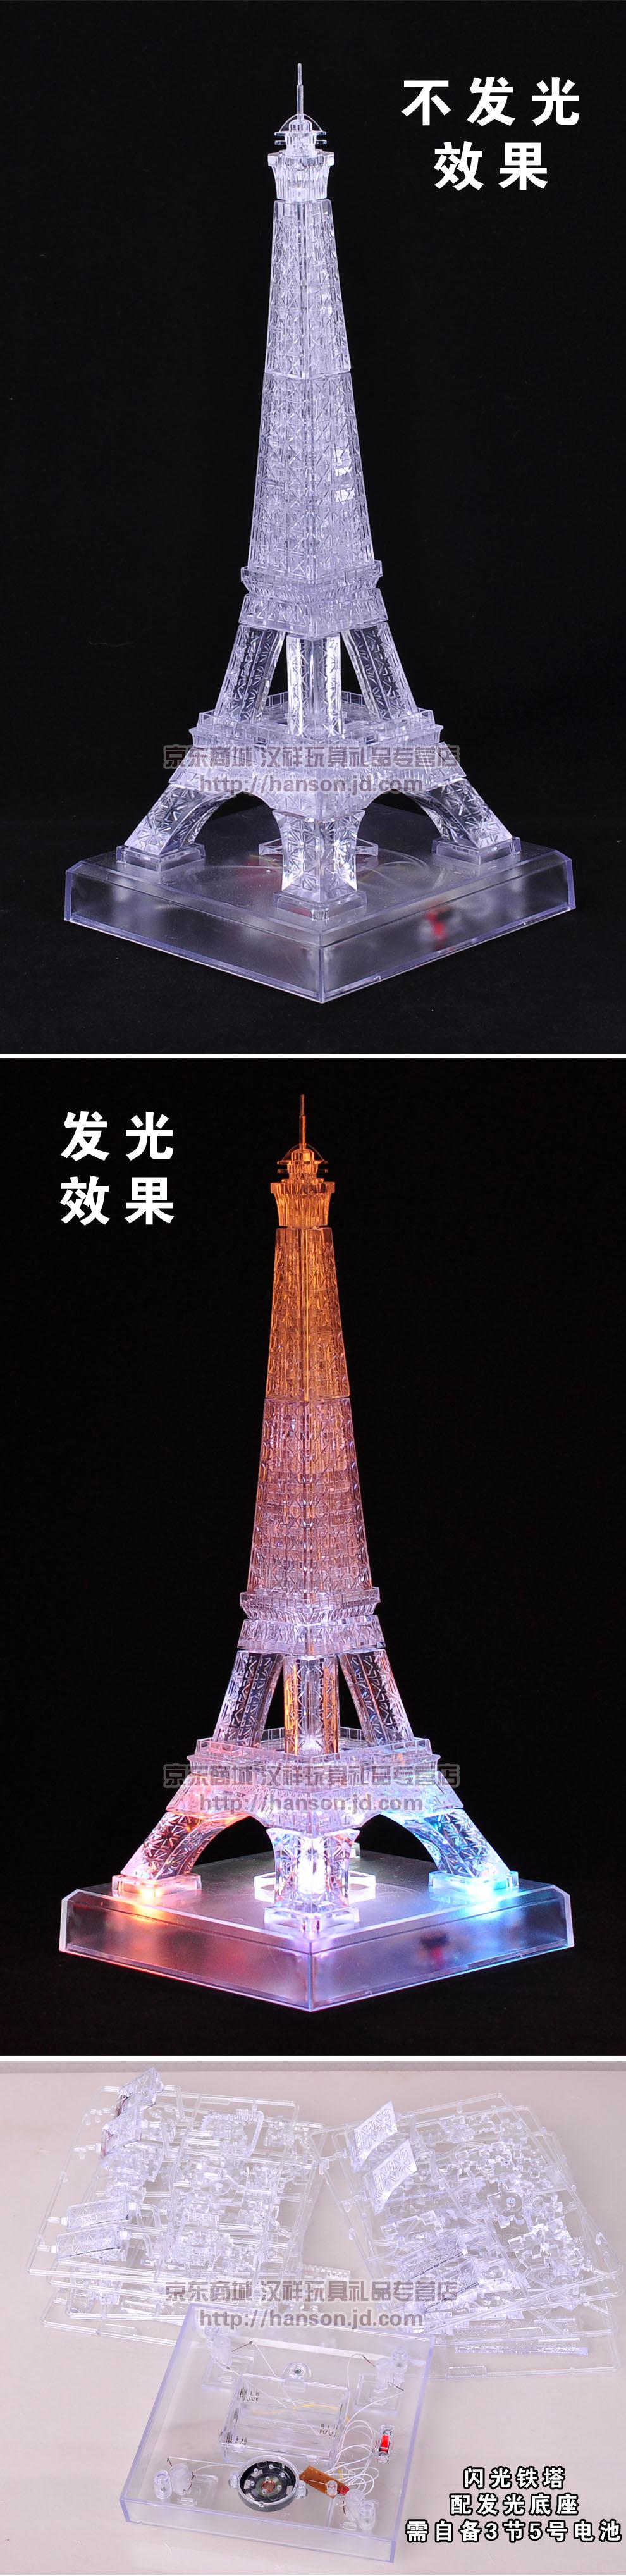 3d立体塑料水晶拼图巴黎埃菲尔铁塔拼装模型创意diy